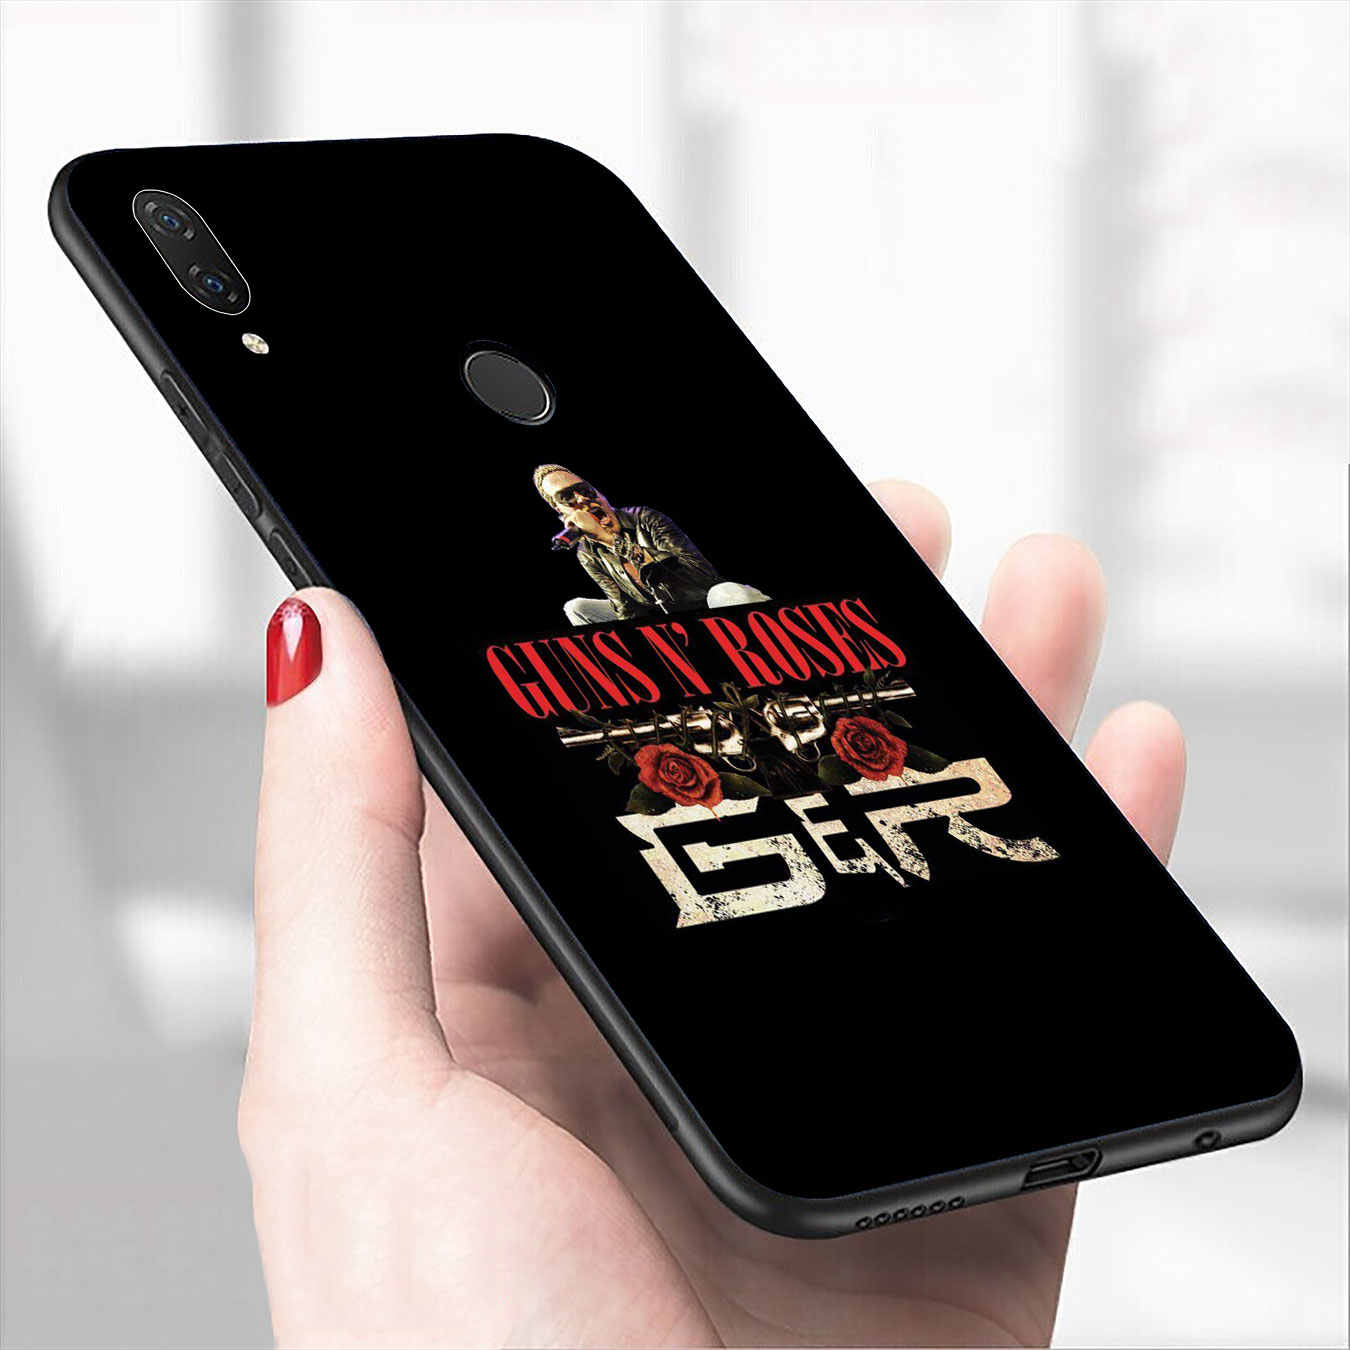 IYICAO guns n roses Guns N' Roses de la caja del teléfono de silicona para Xiaomi Redmi 8A 7A 6A 5A K20 S2 4A 4X Nota 8 7 6 Pro 5 Plus